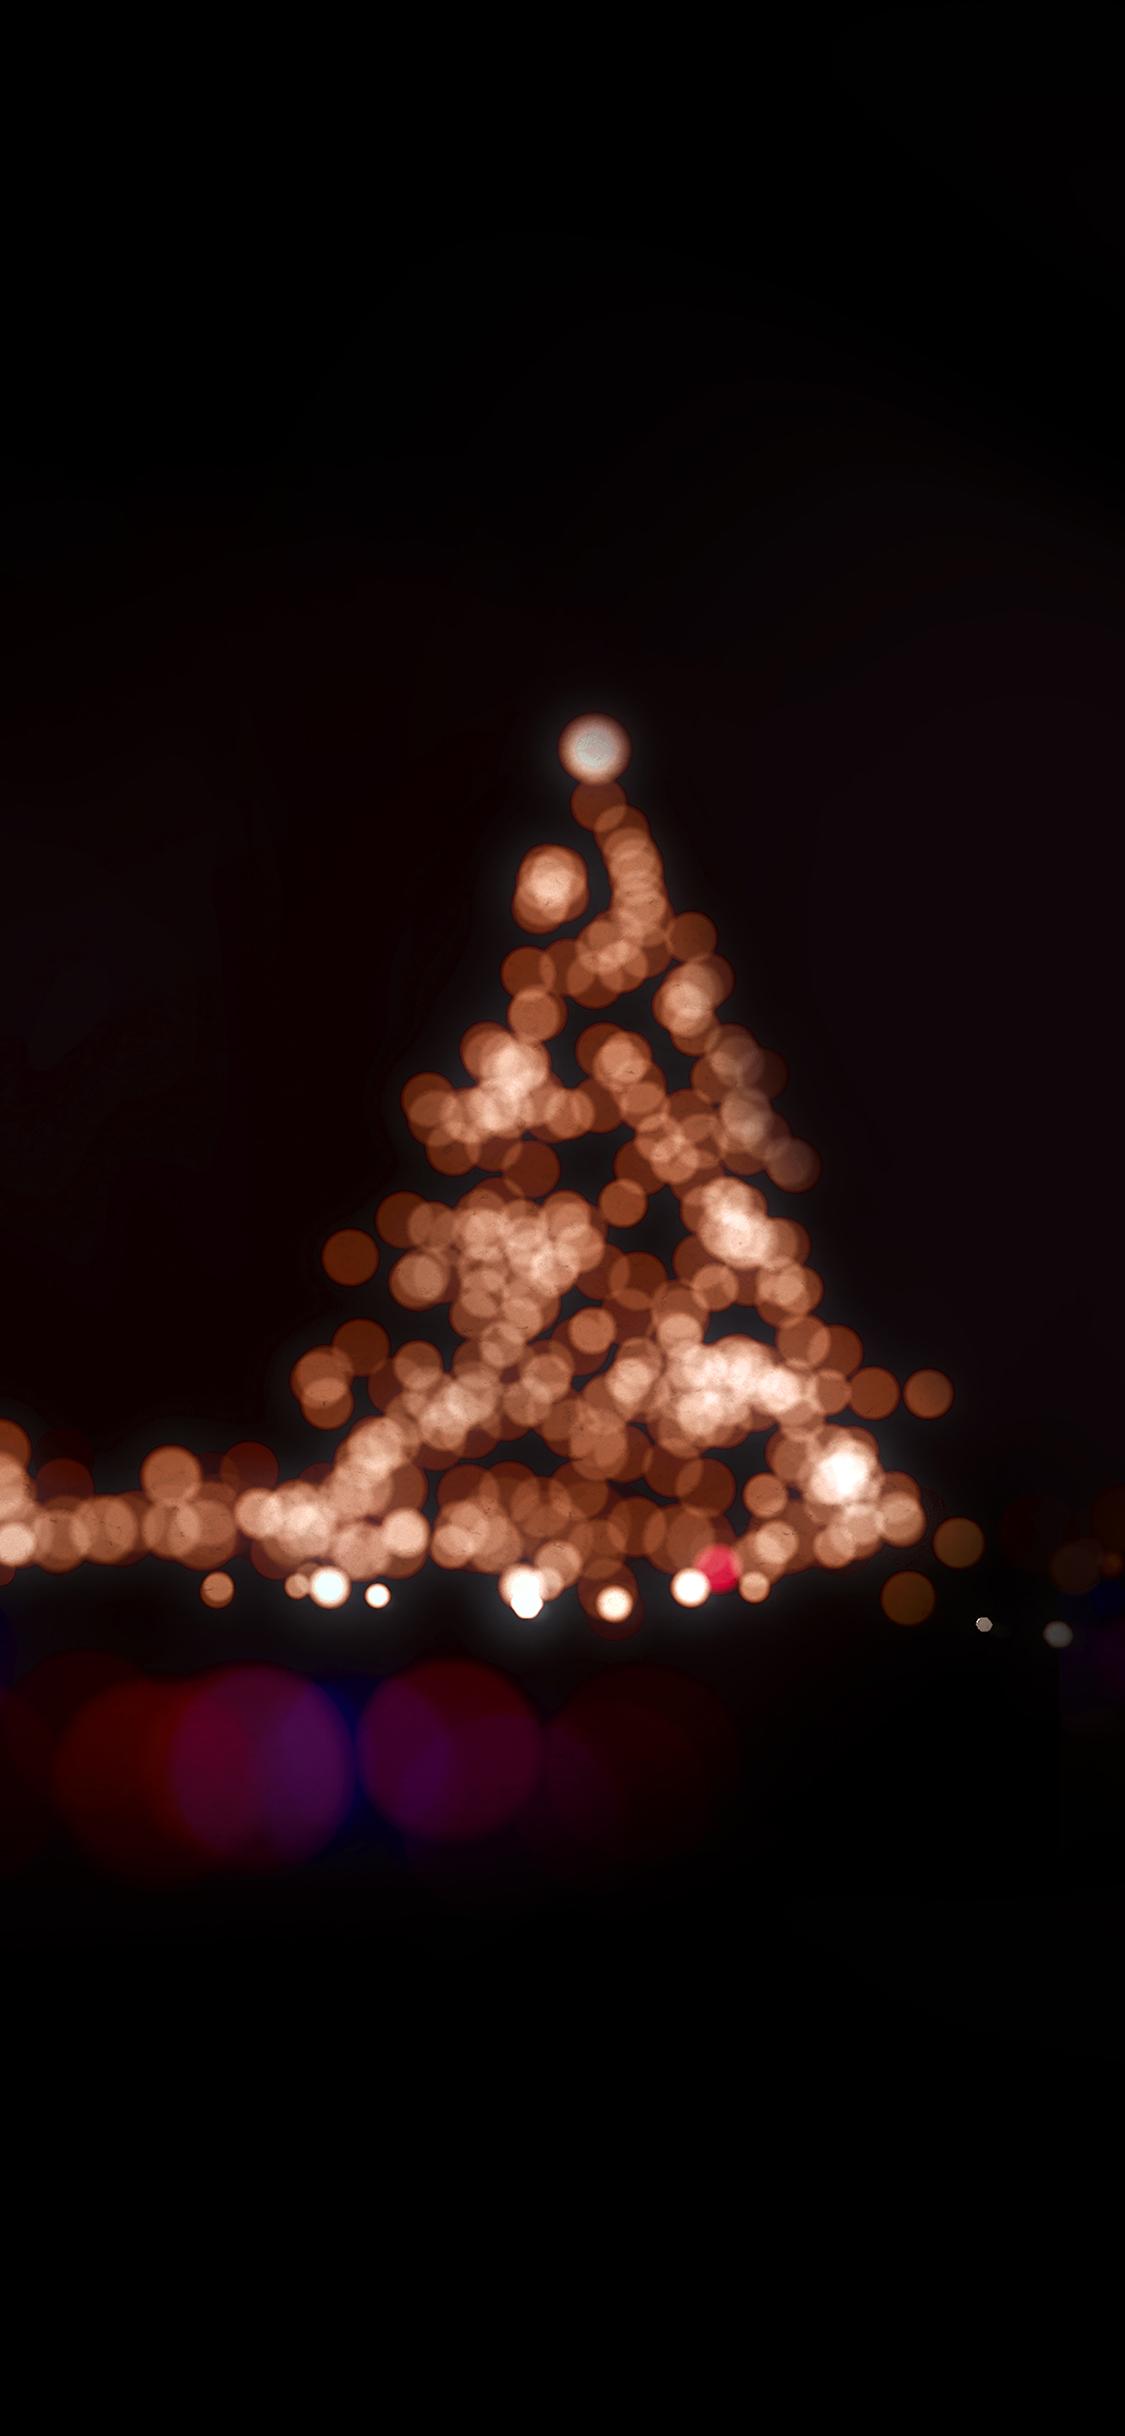 Iphonexpapers Ah38 Christmas Lights Bokeh Love Dark Night